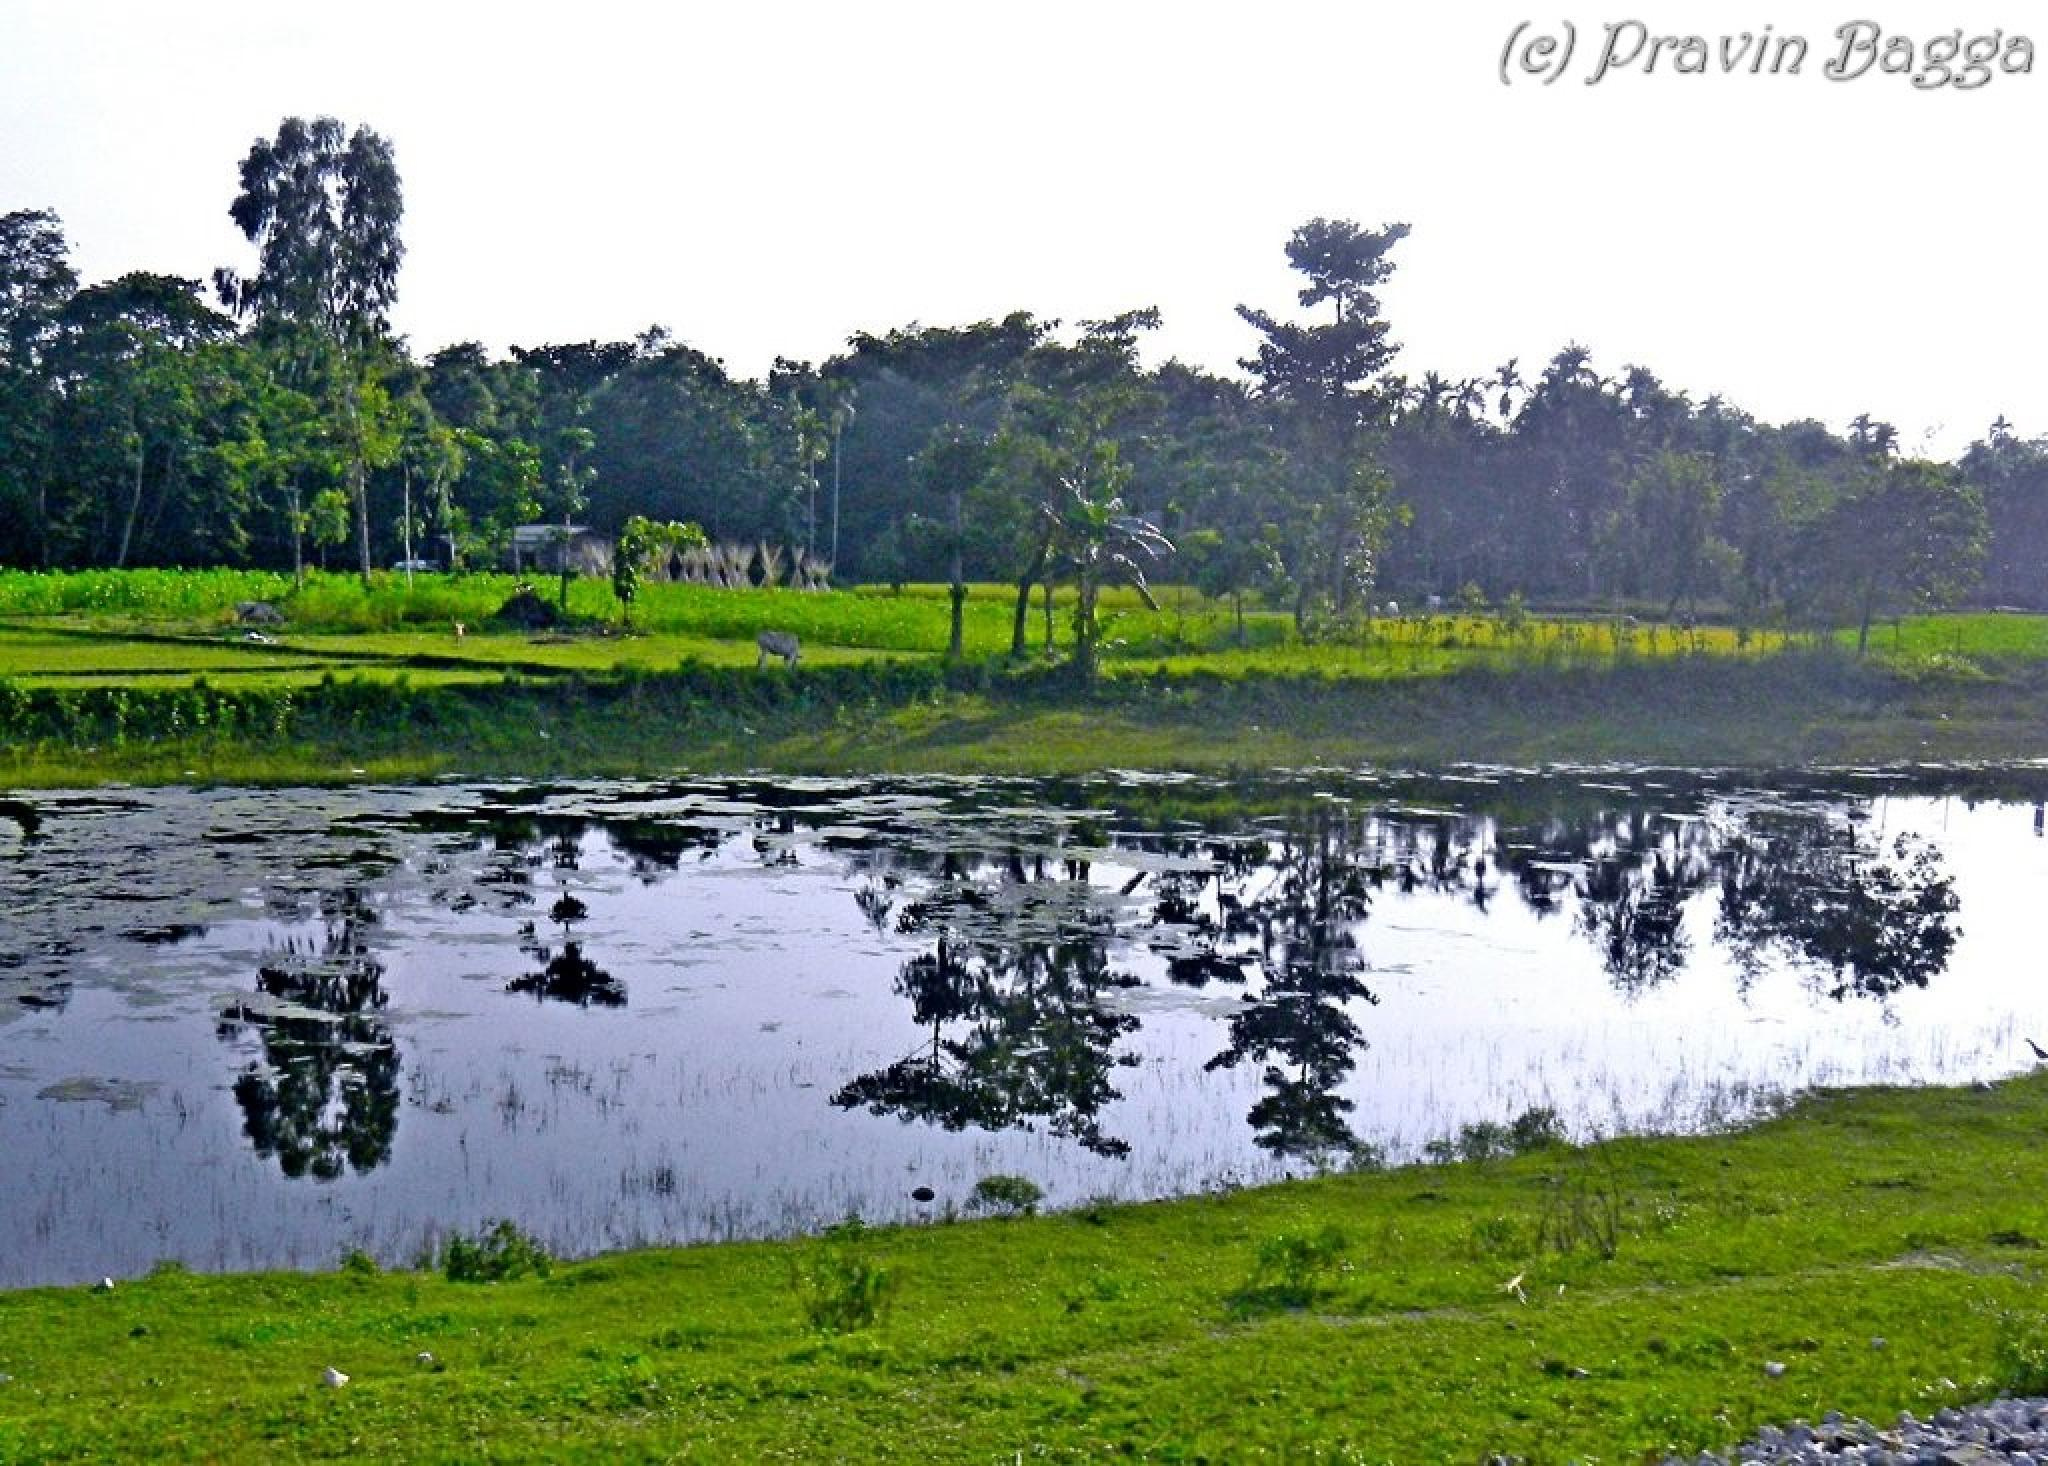 Reflection by Pravin Bagga